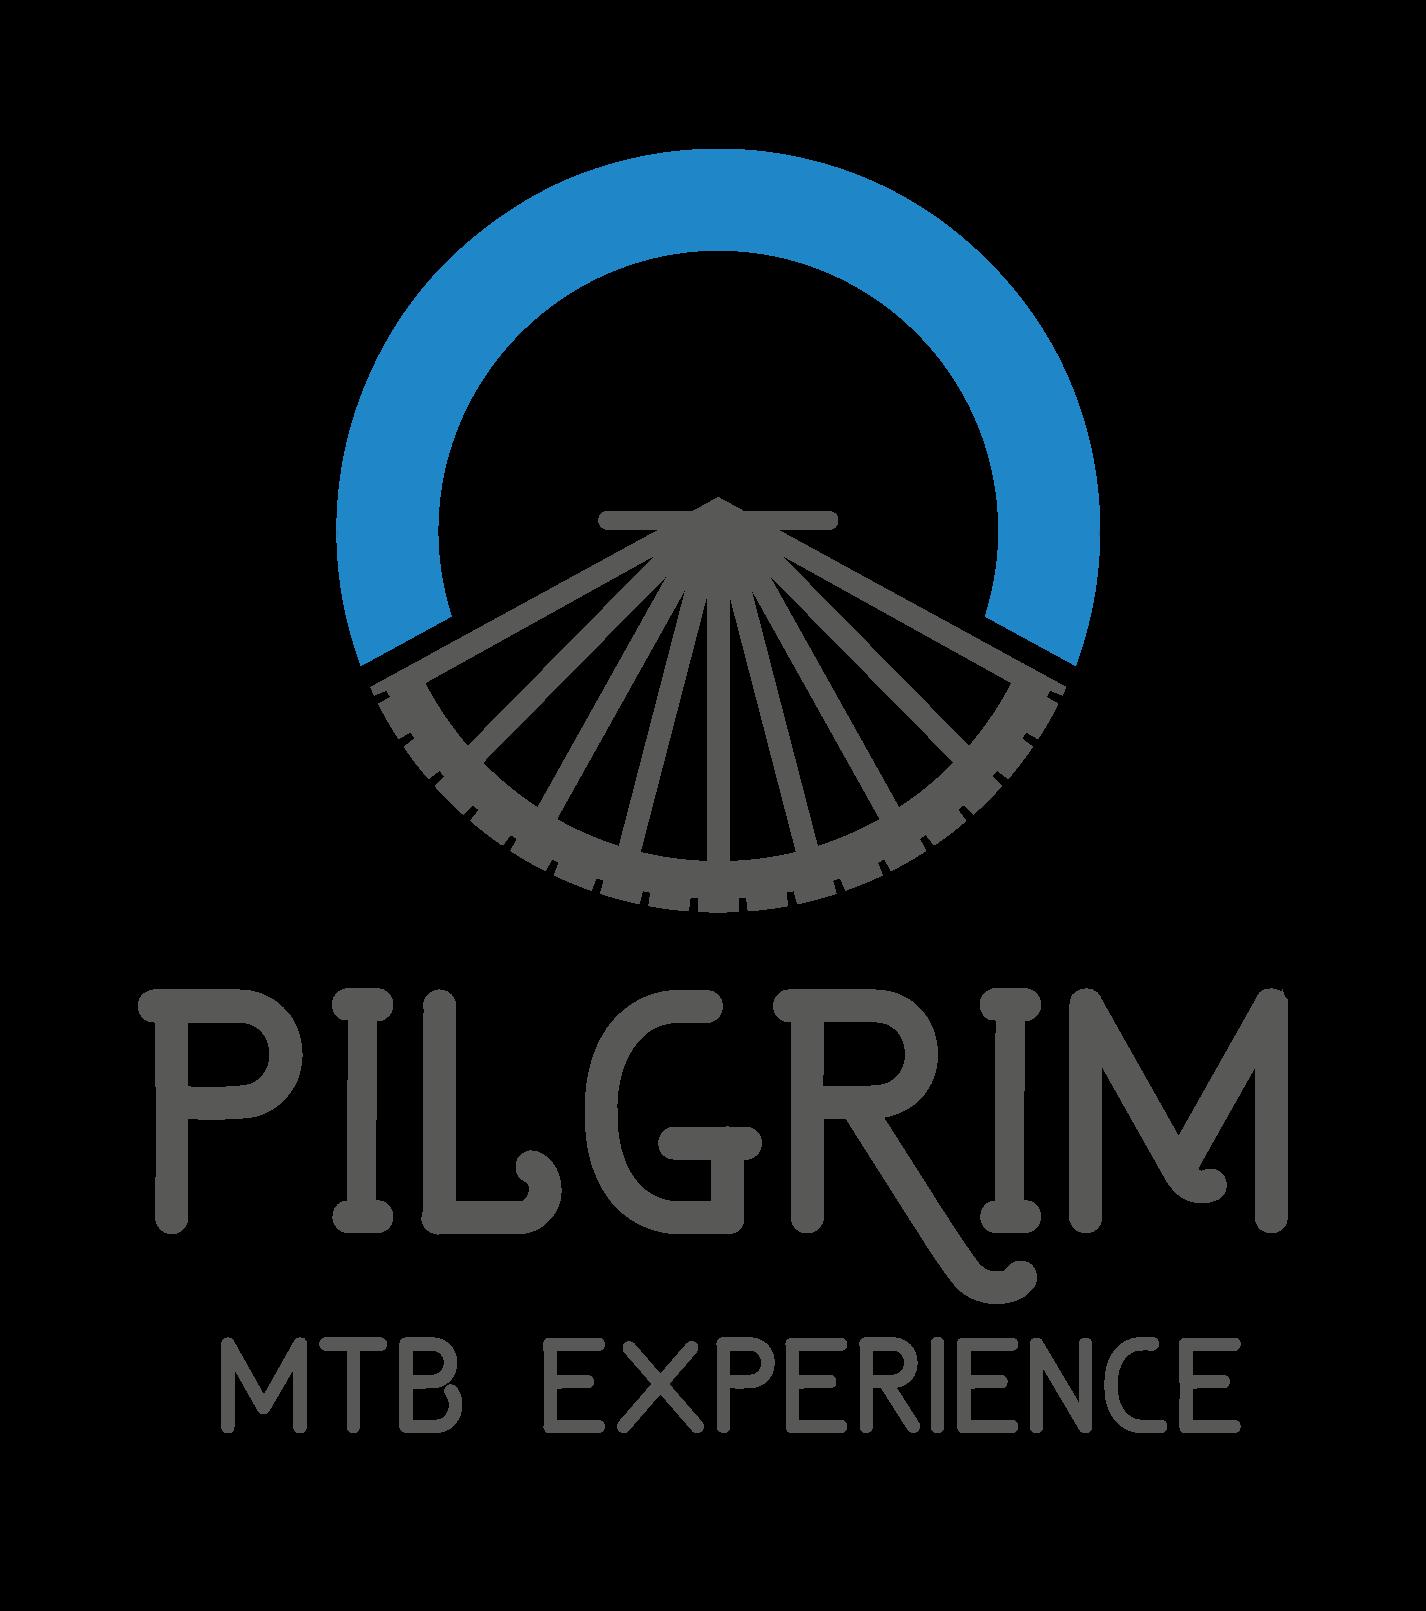 Pilgrim Experience MTB